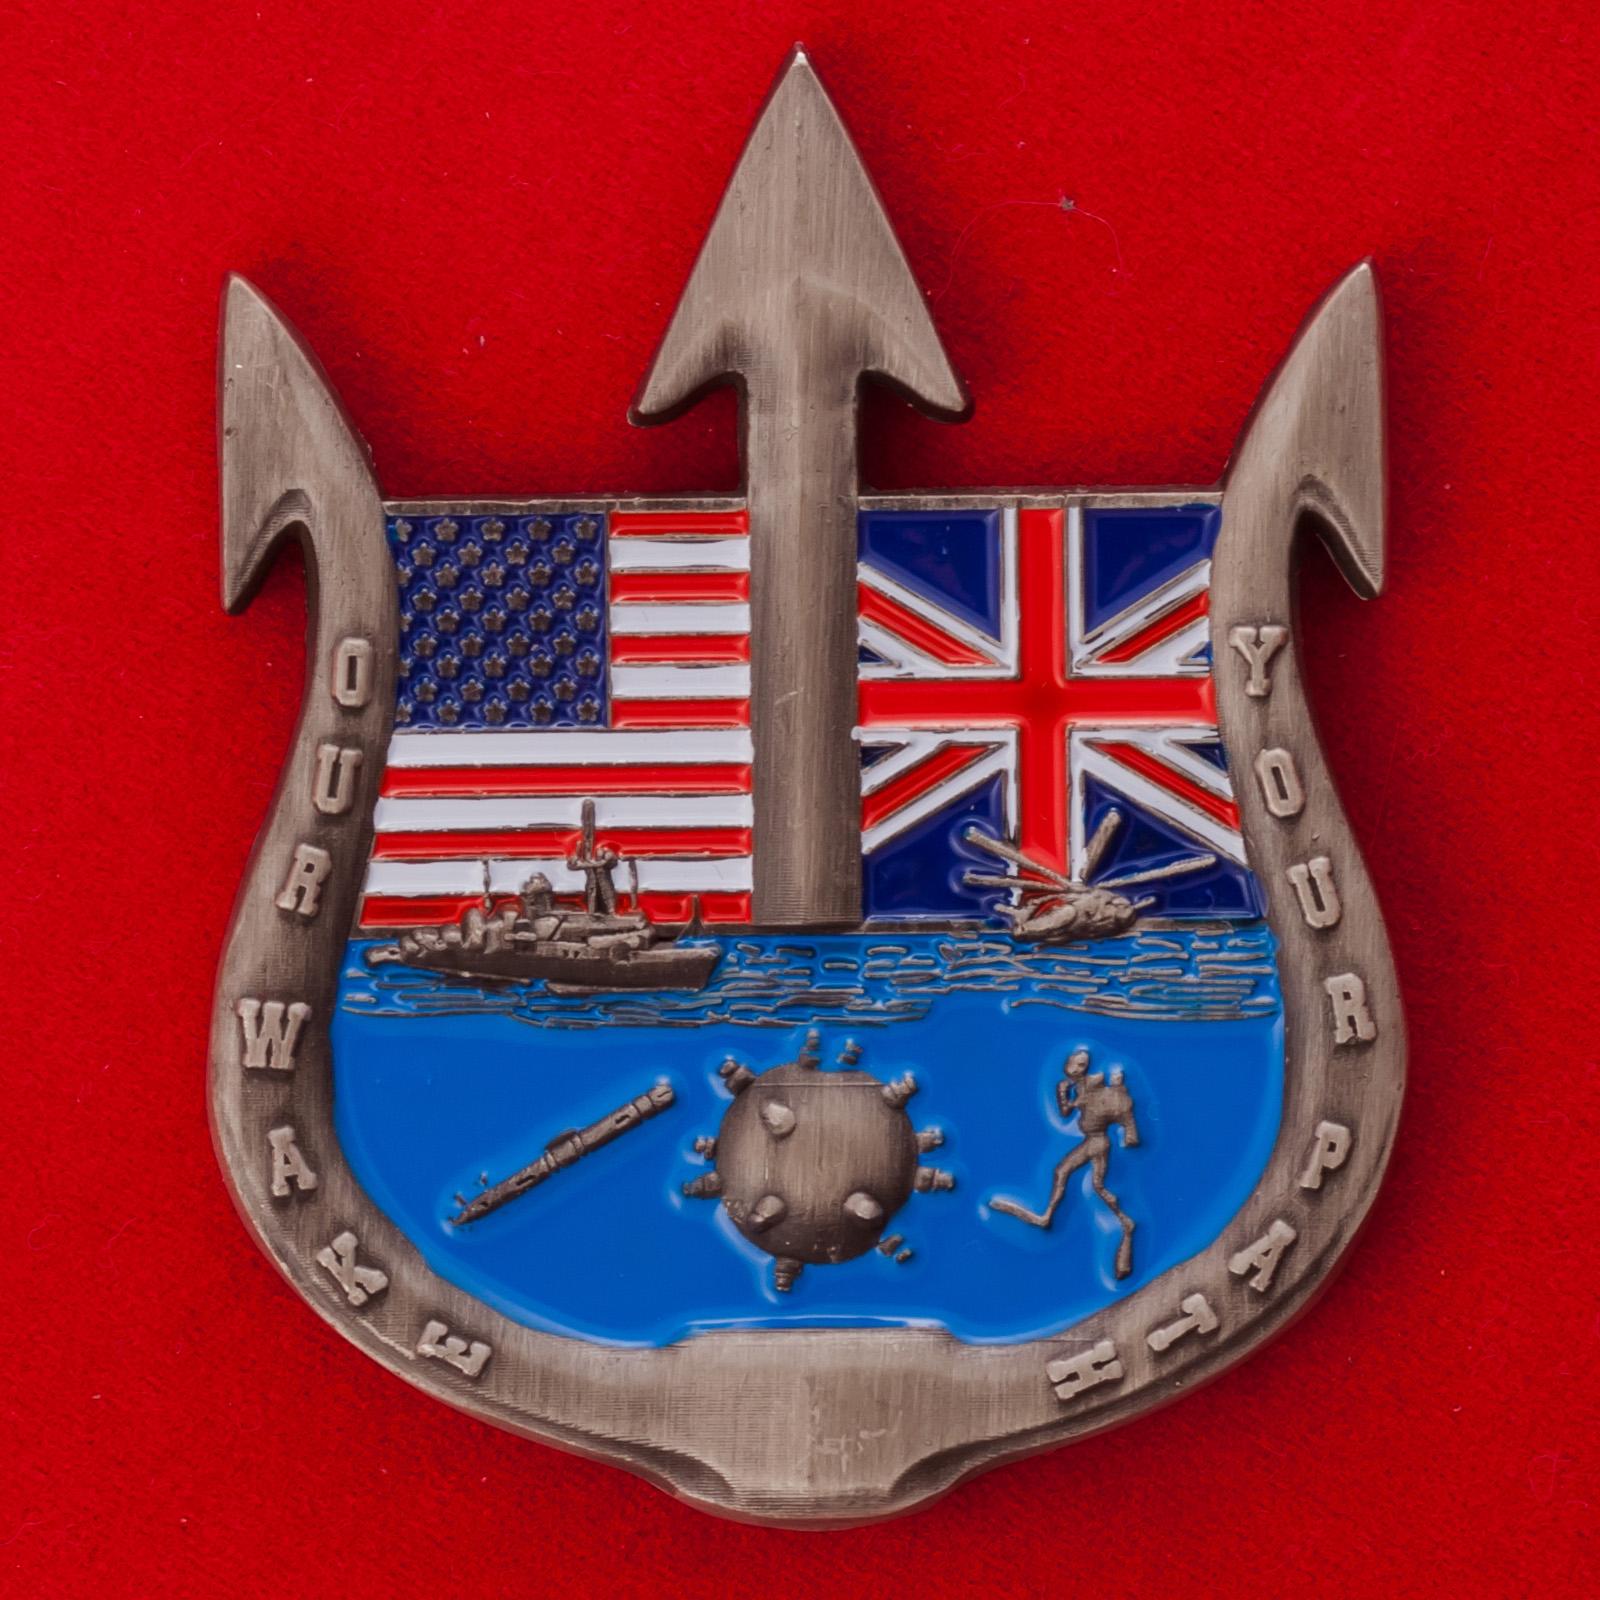 Челлендж коин командира 52-го оперативного соединения водолазов ВМС США